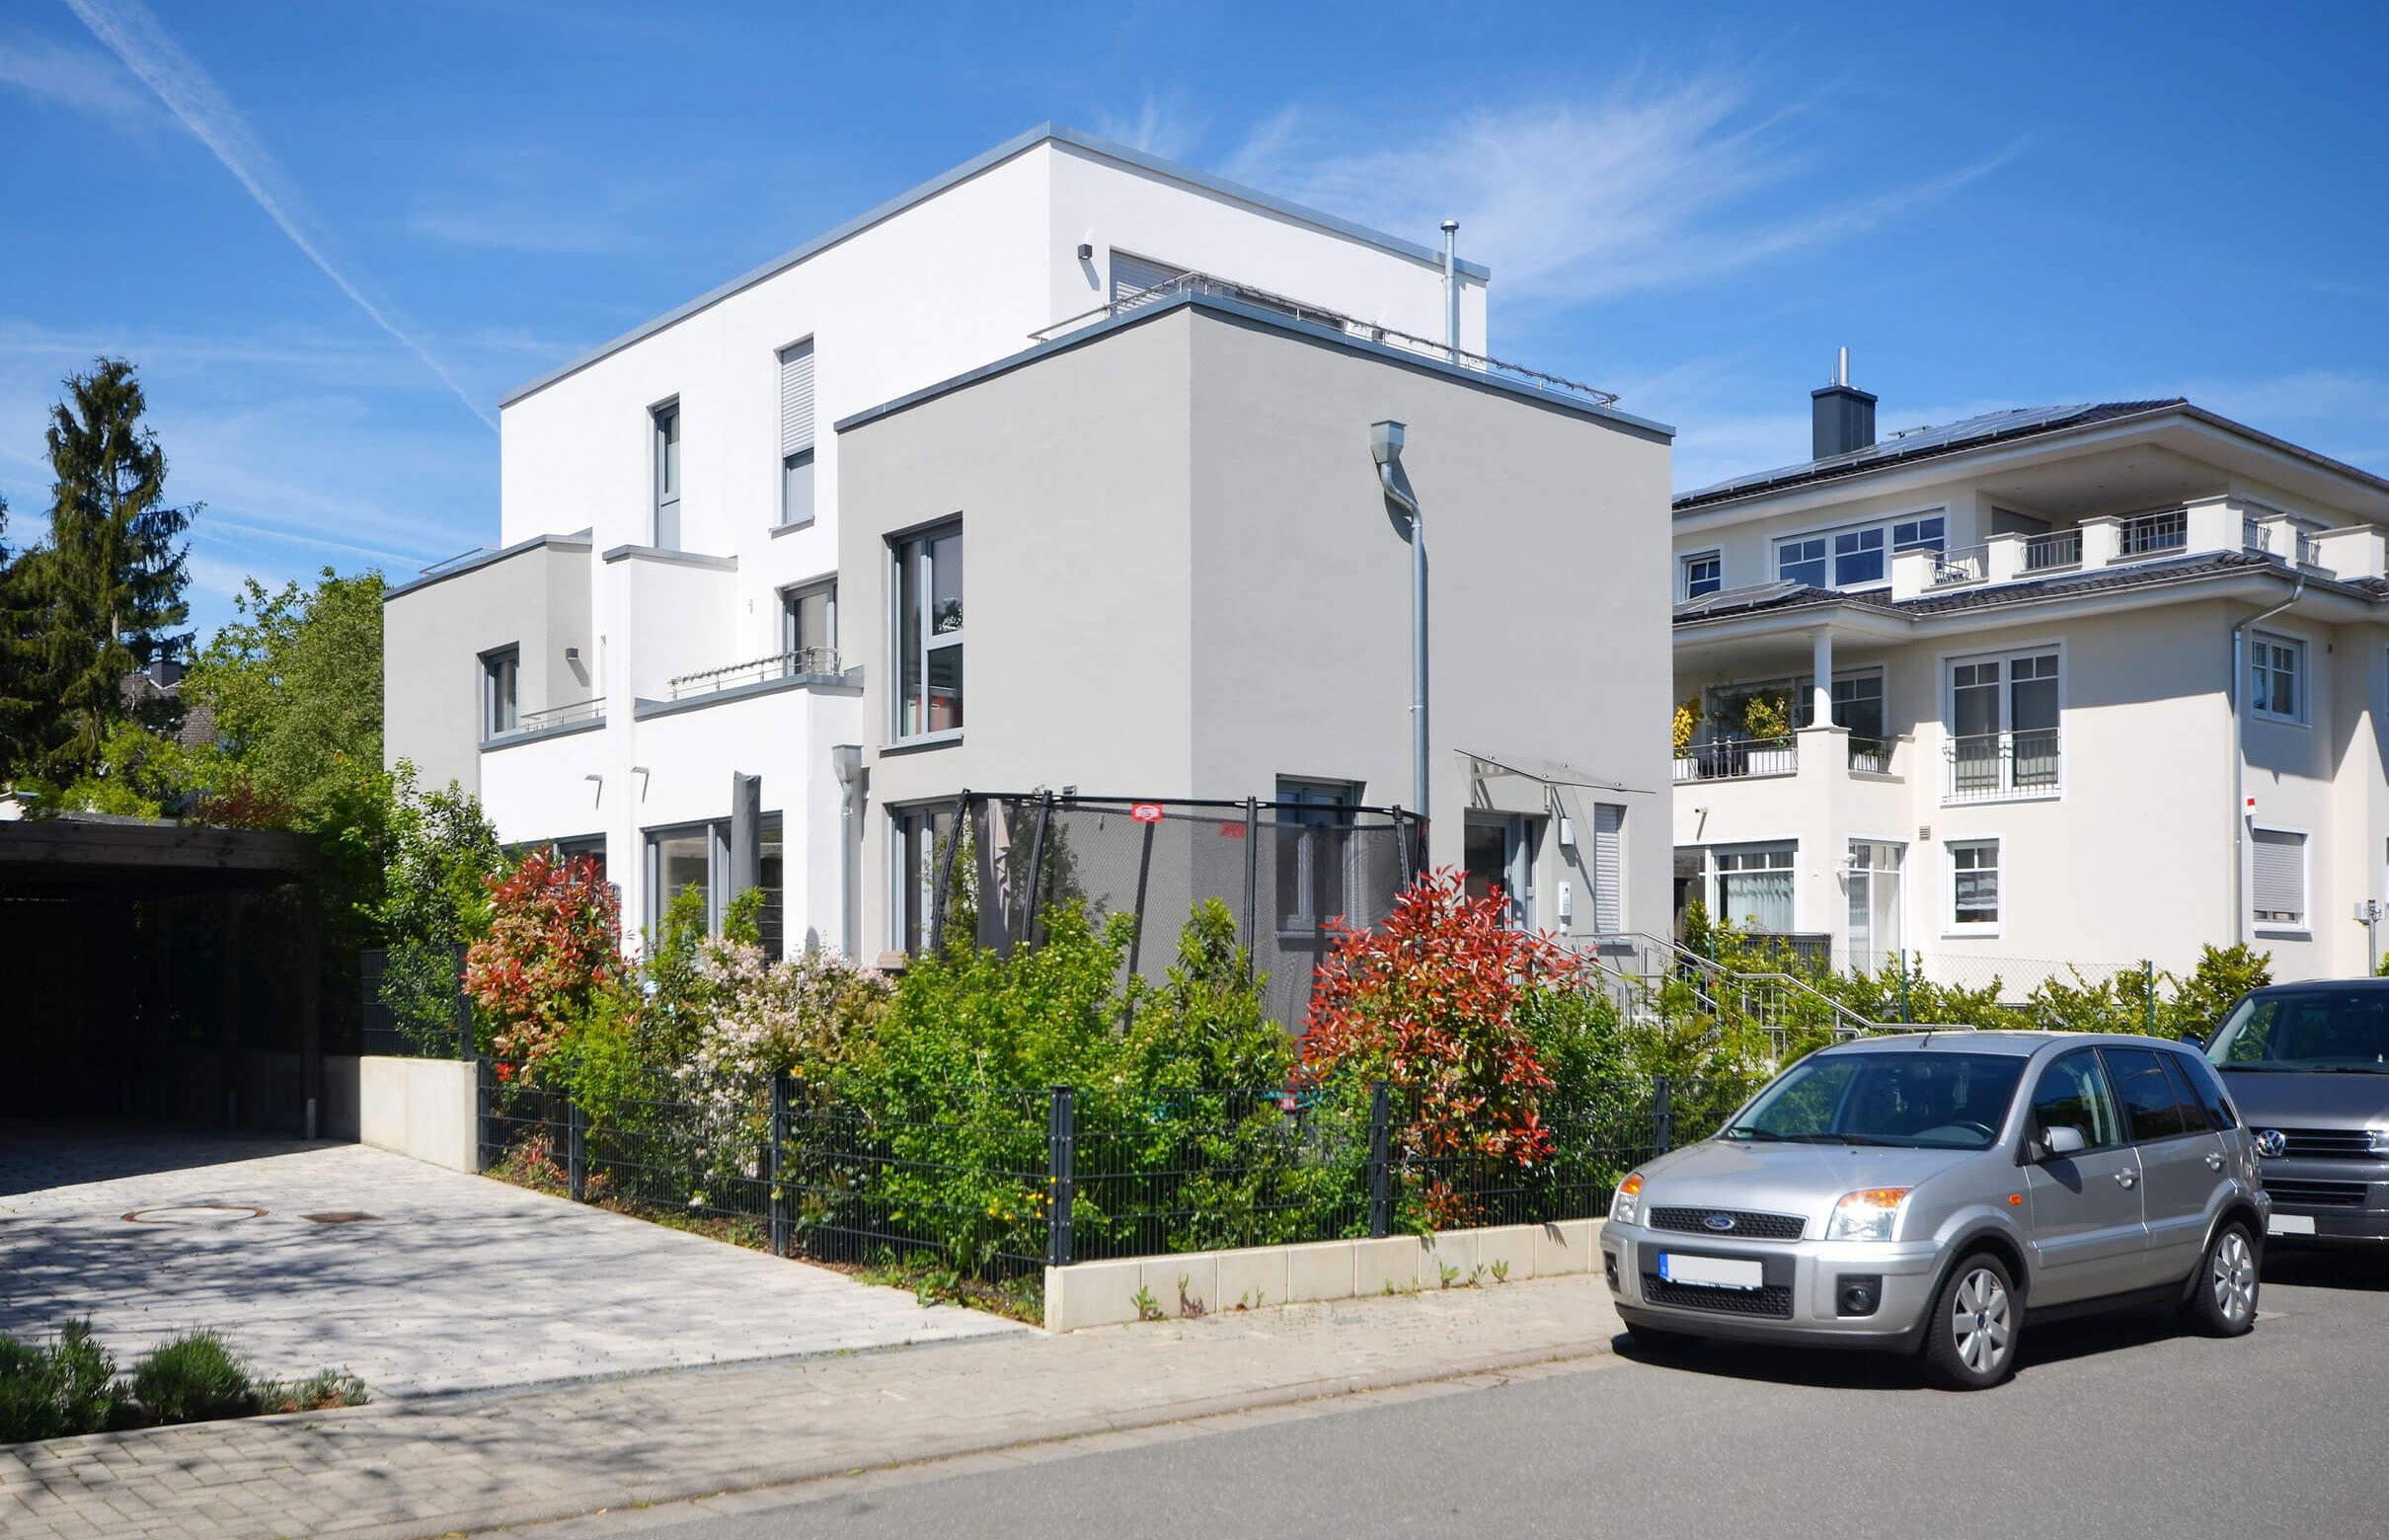 Damian Werner - Neubau - Henricusstraße, Oberursel